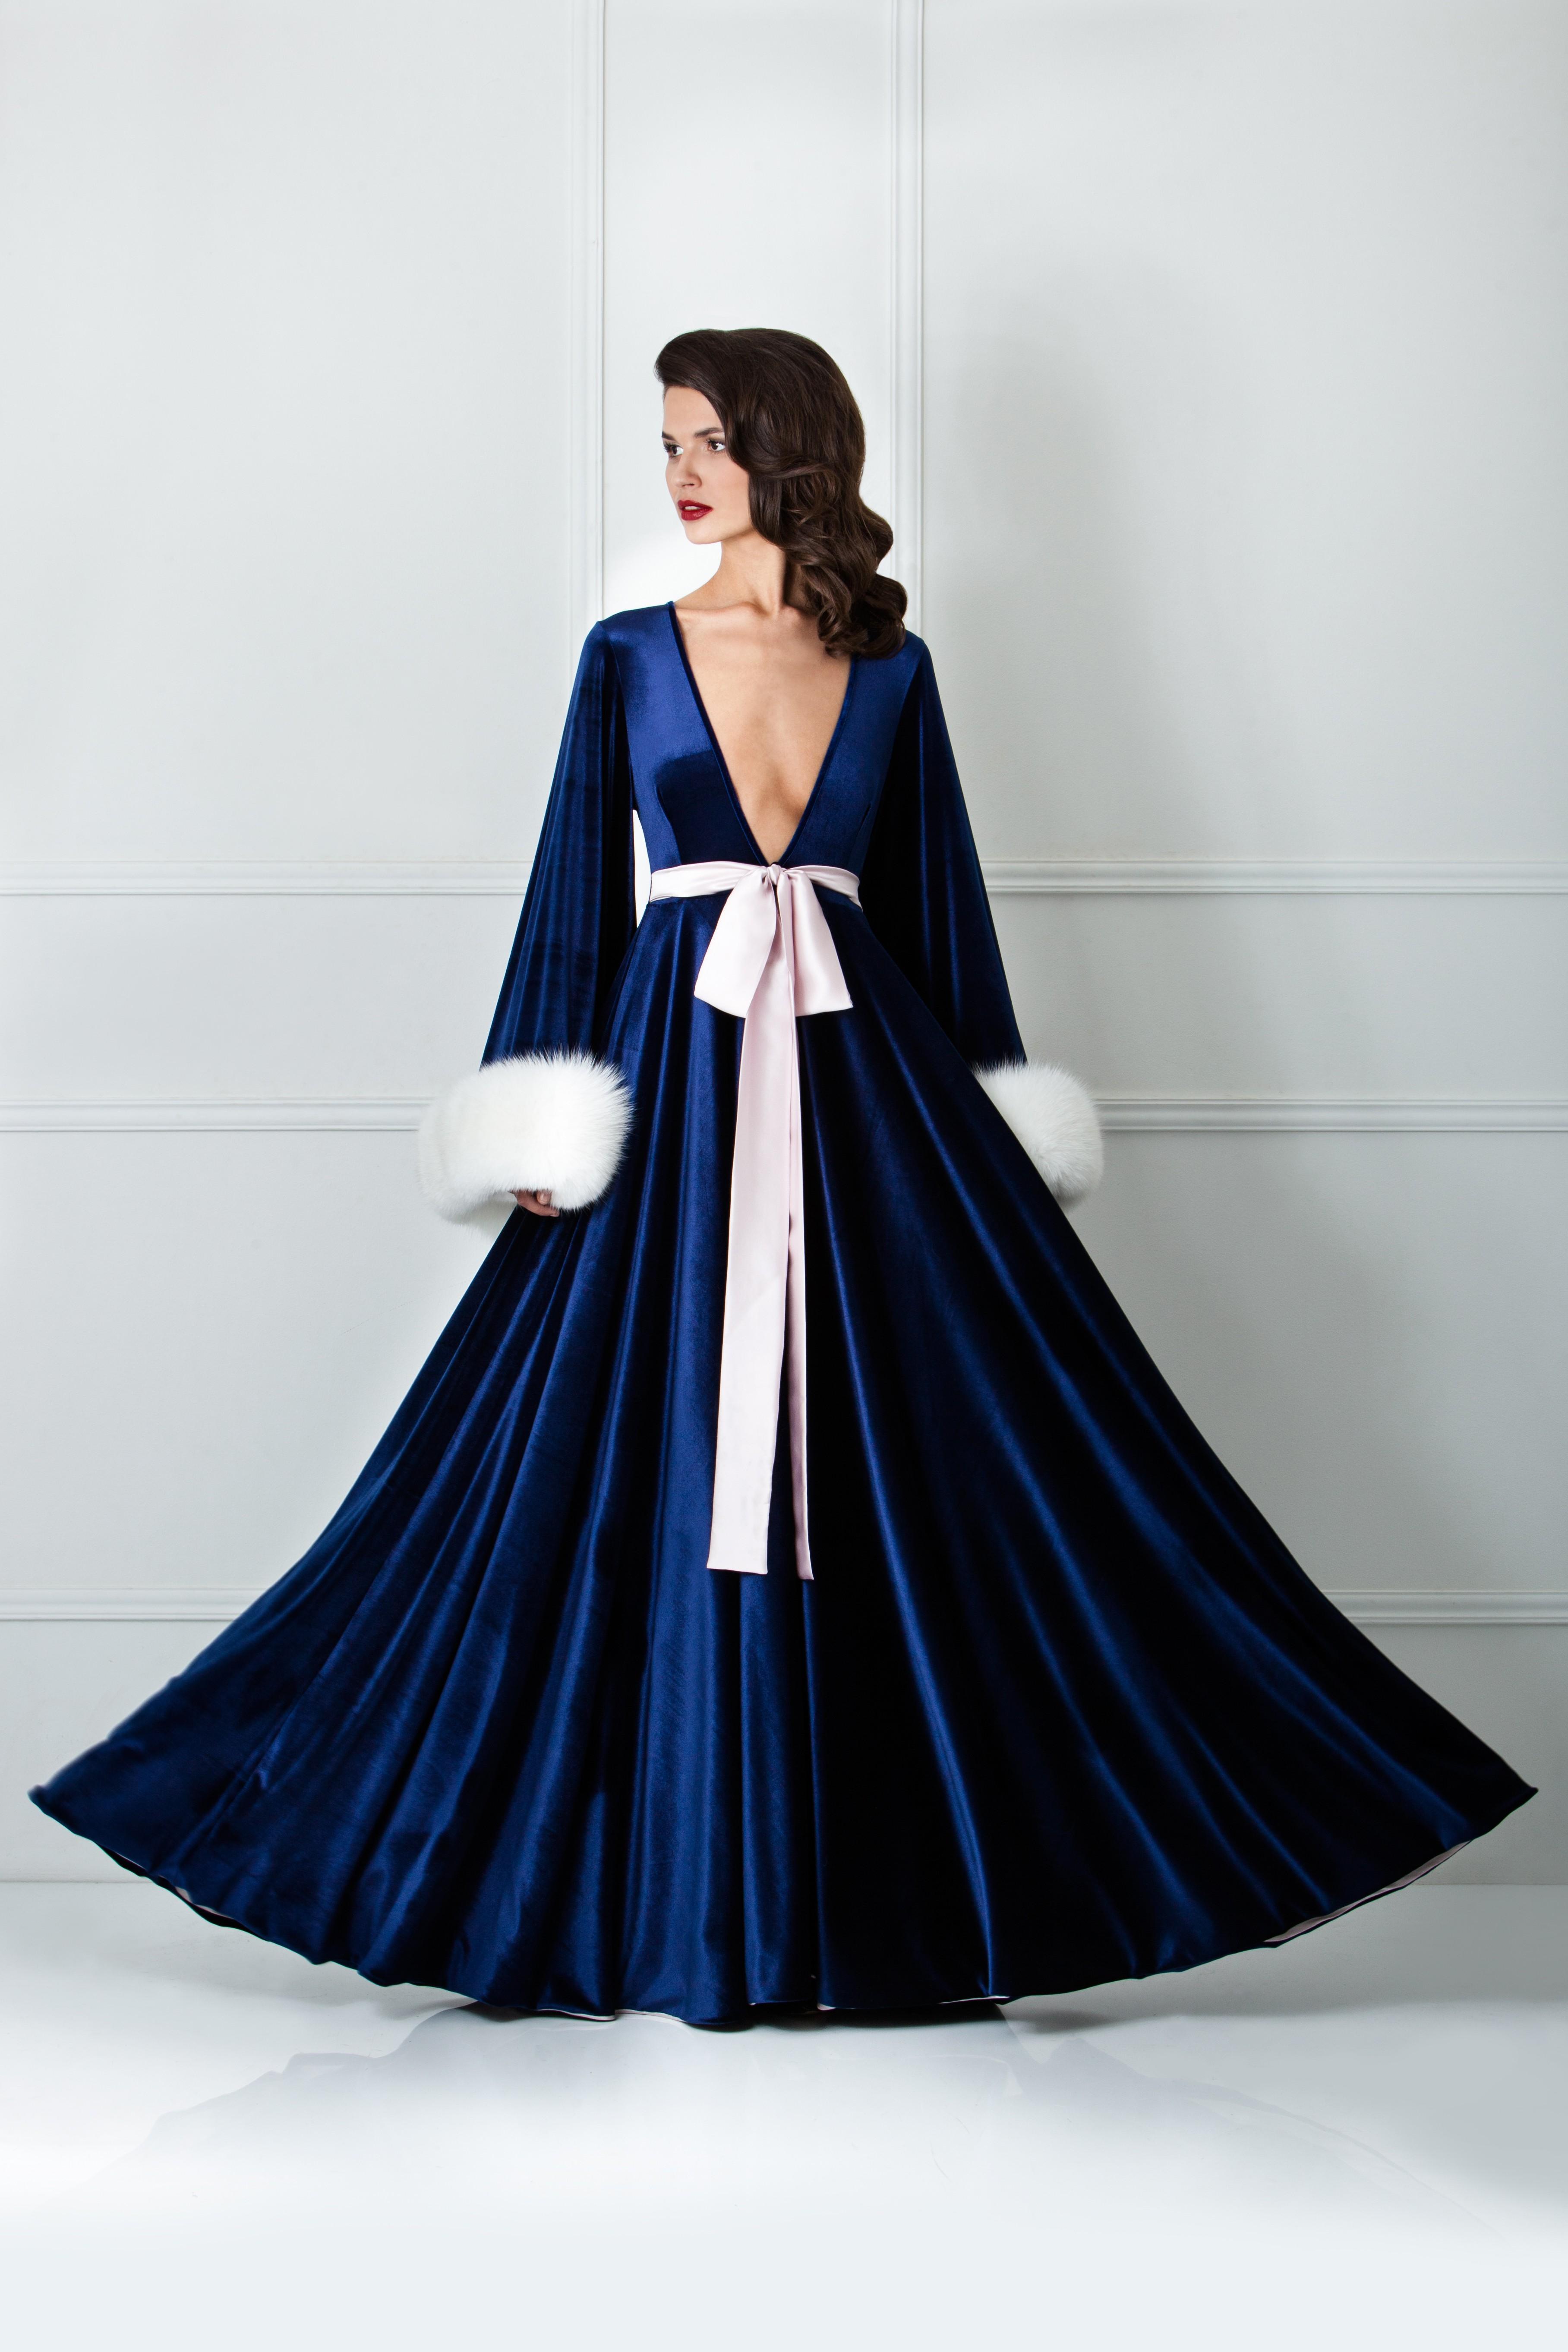 Бархатный халат Saphire от Amoralle, €1,245